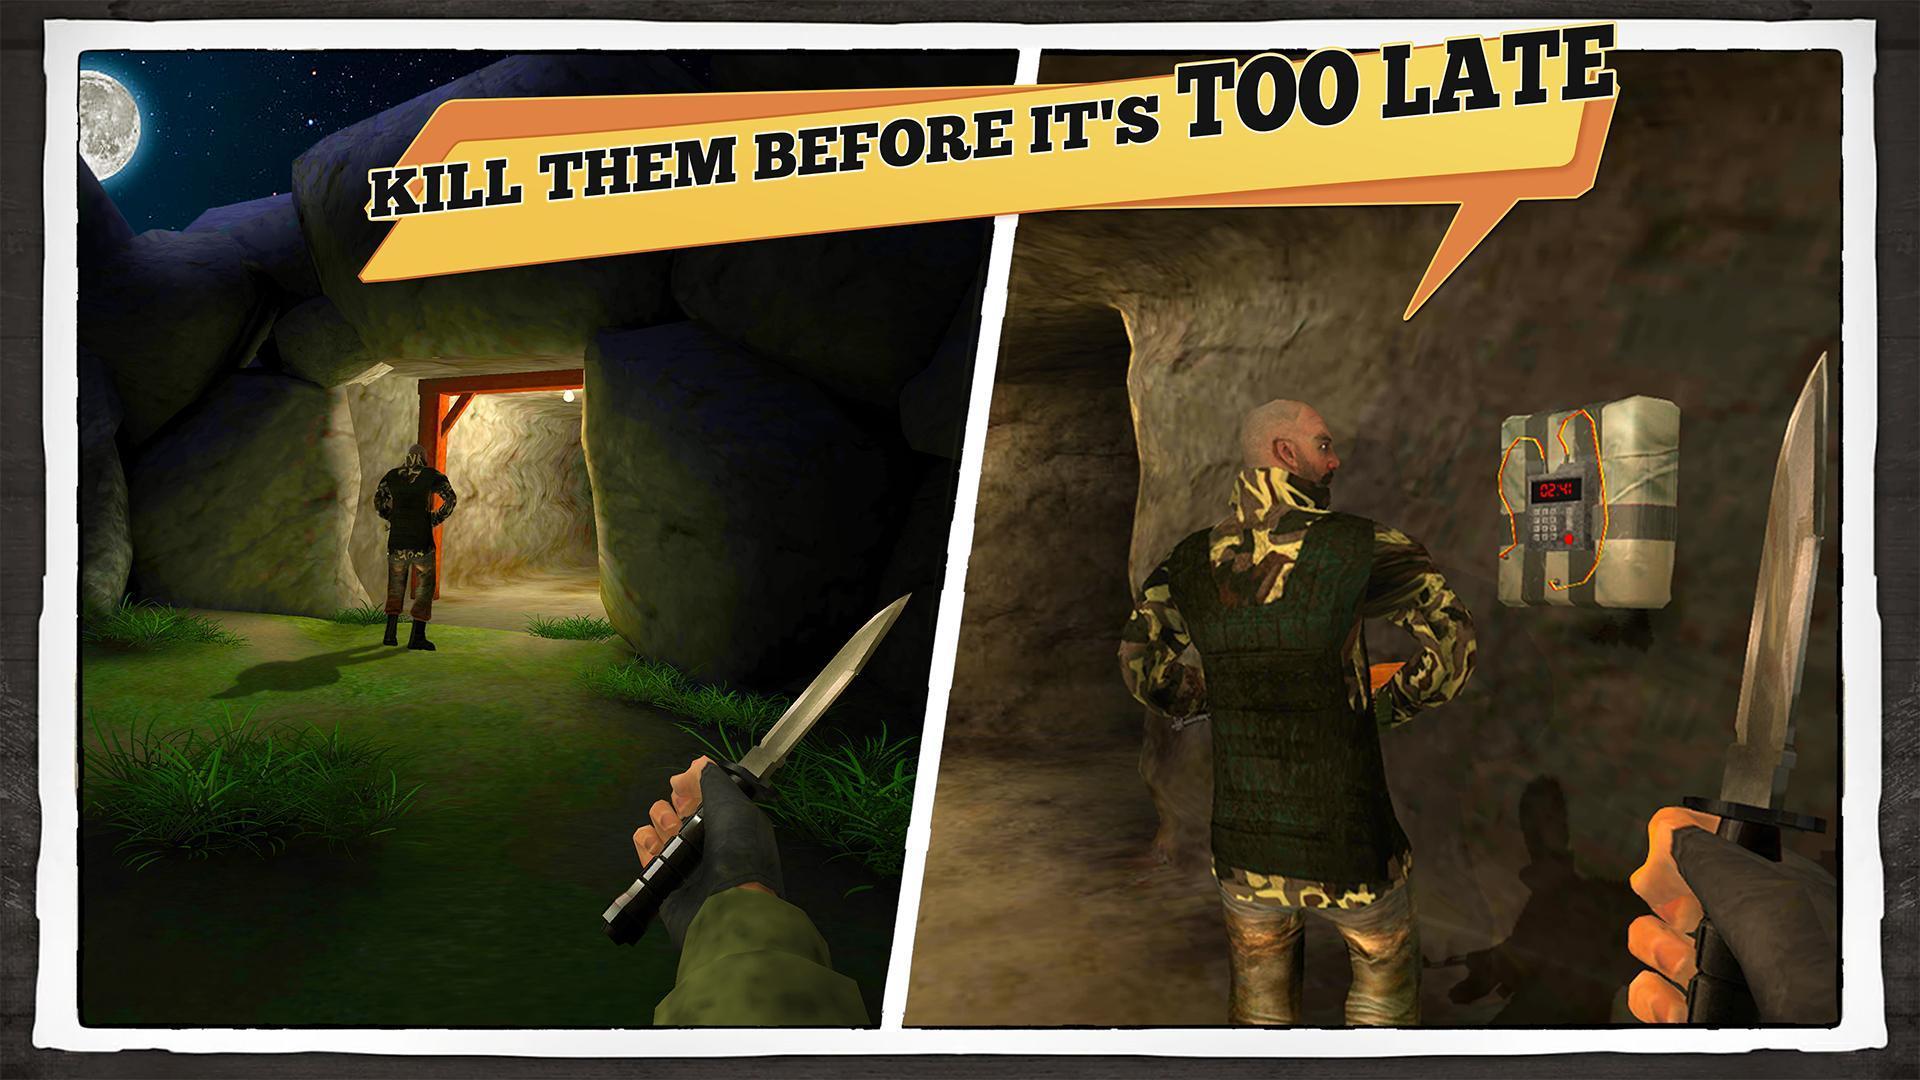 Yalghaar Delta IGI Commando Adventure Mobile Game 3.4 Screenshot 5